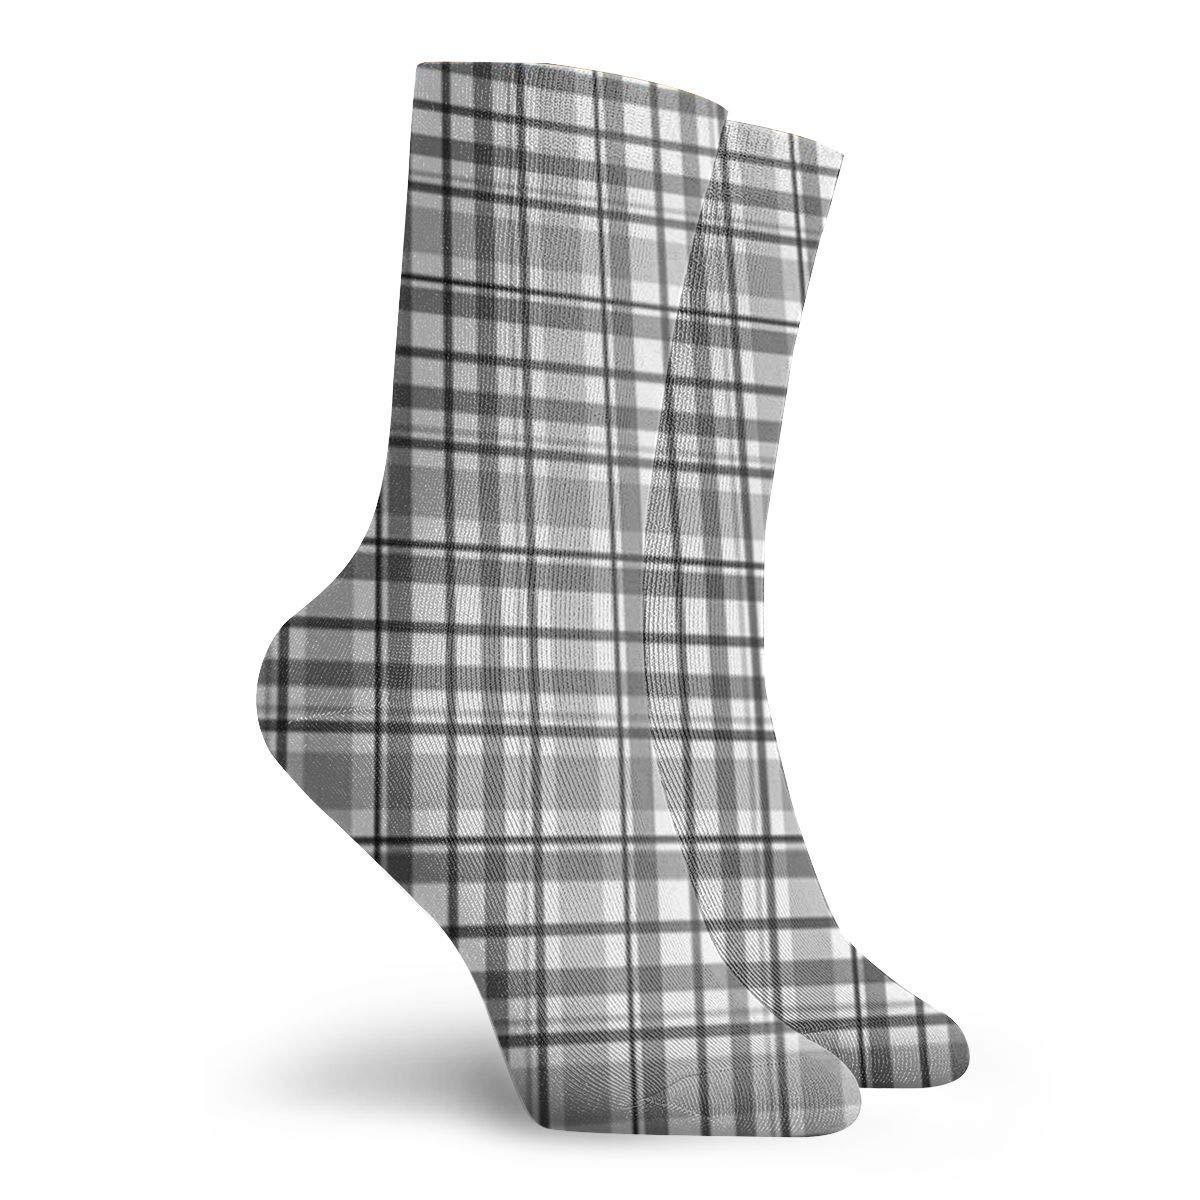 Gray Plaid Unisex Funny Casual Crew Socks Athletic Socks For Boys Girls Kids Teenagers